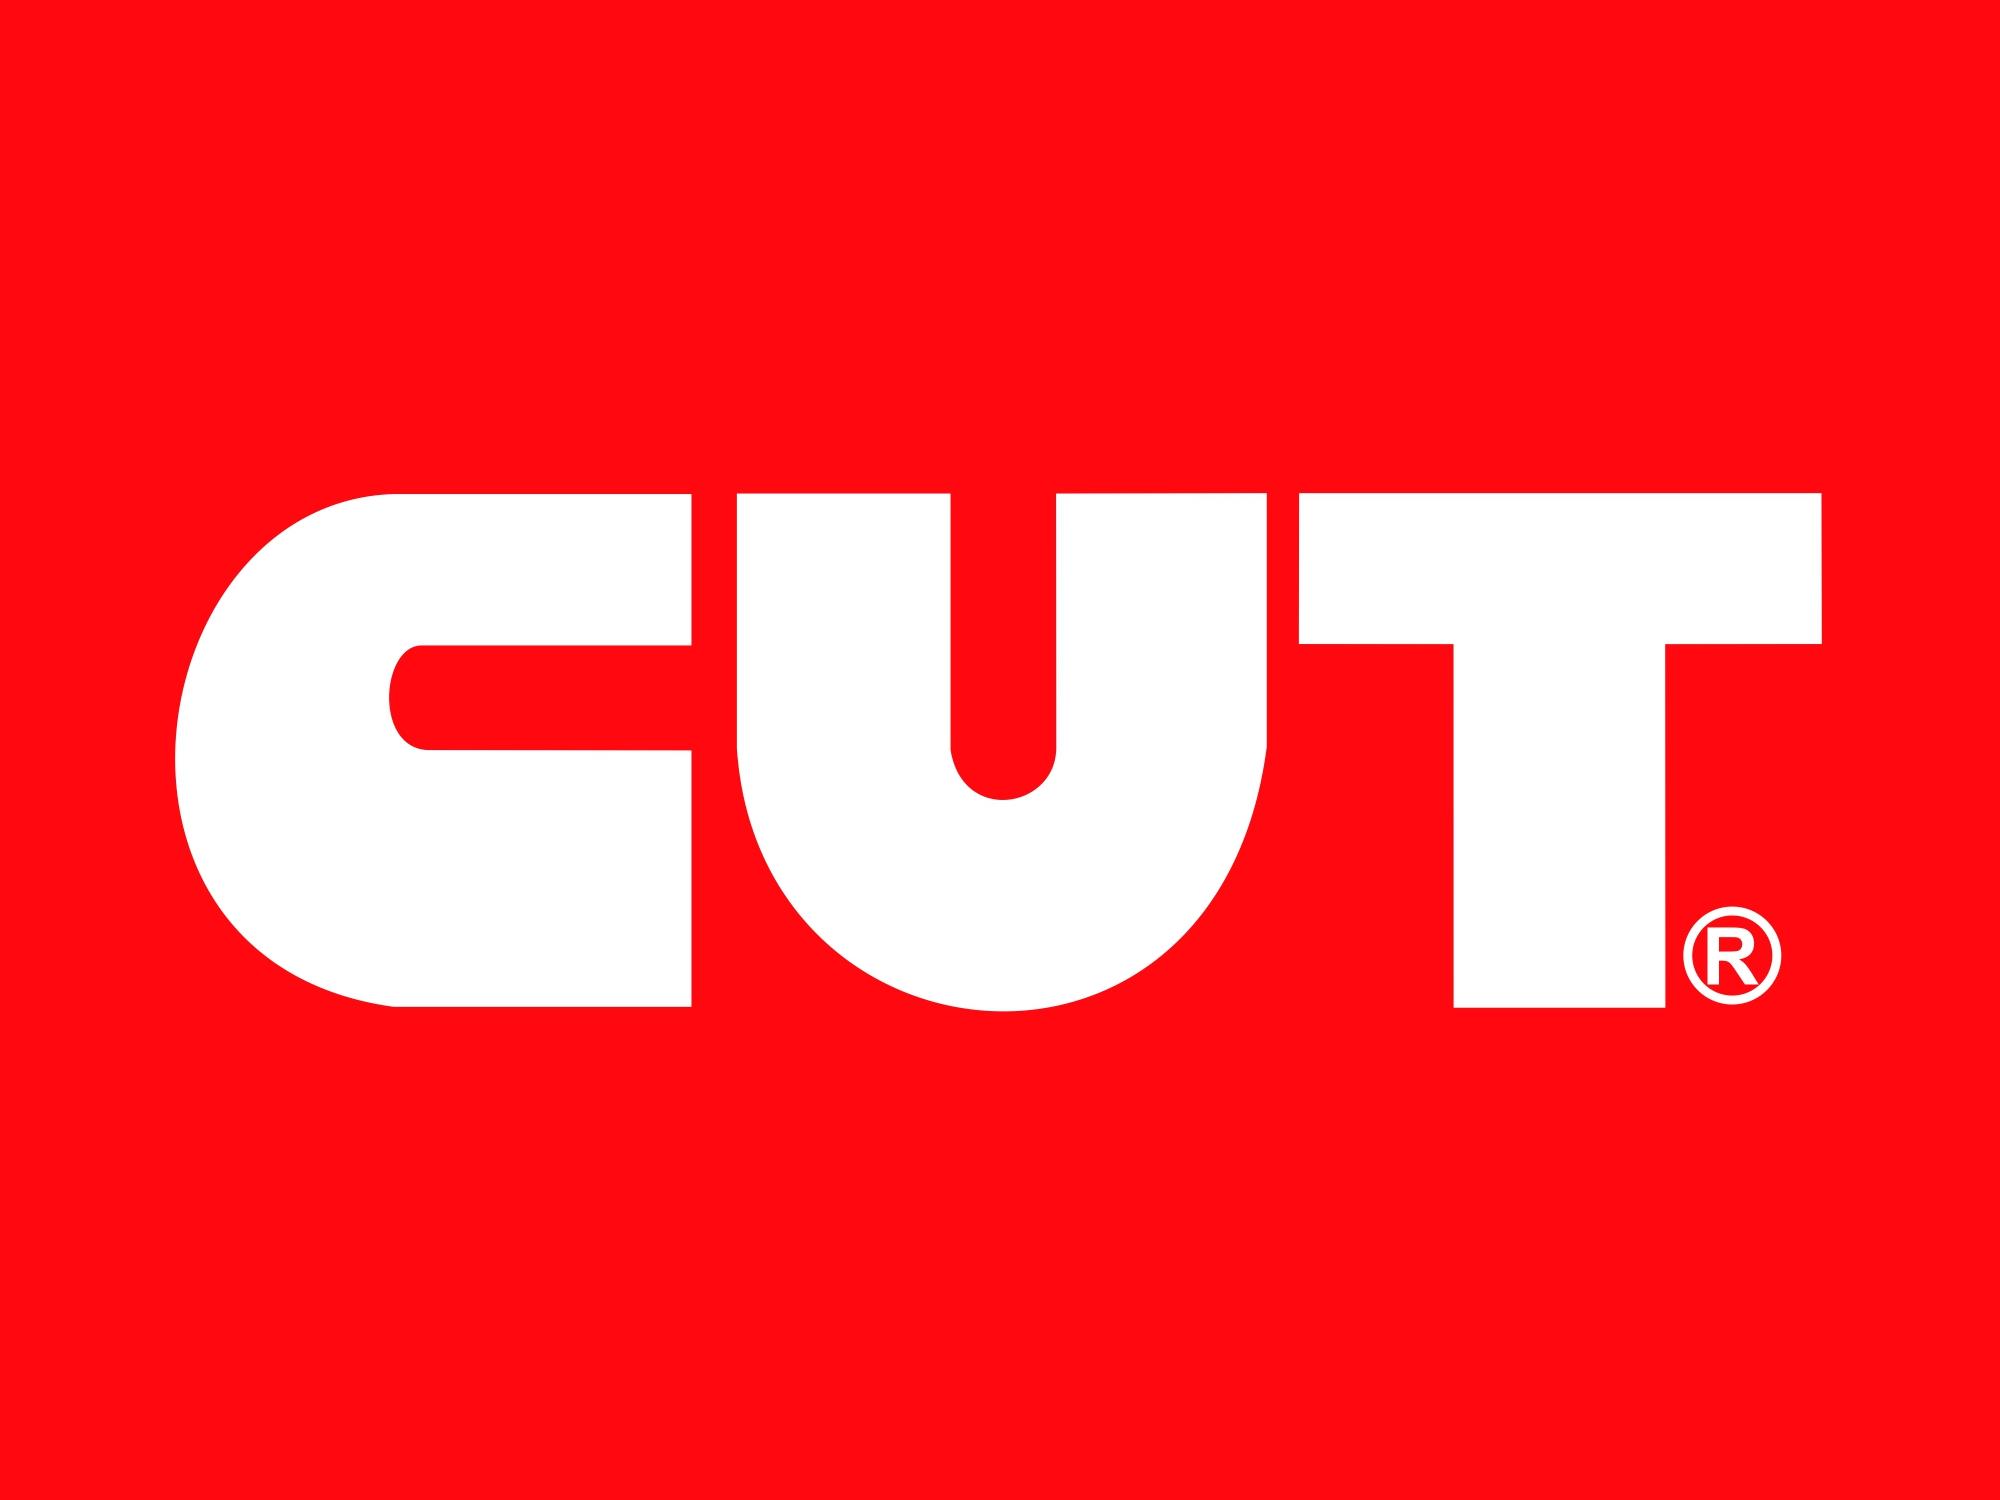 cut logo 3 - Central Única dos Trabalhadores Logo - CUT Logo